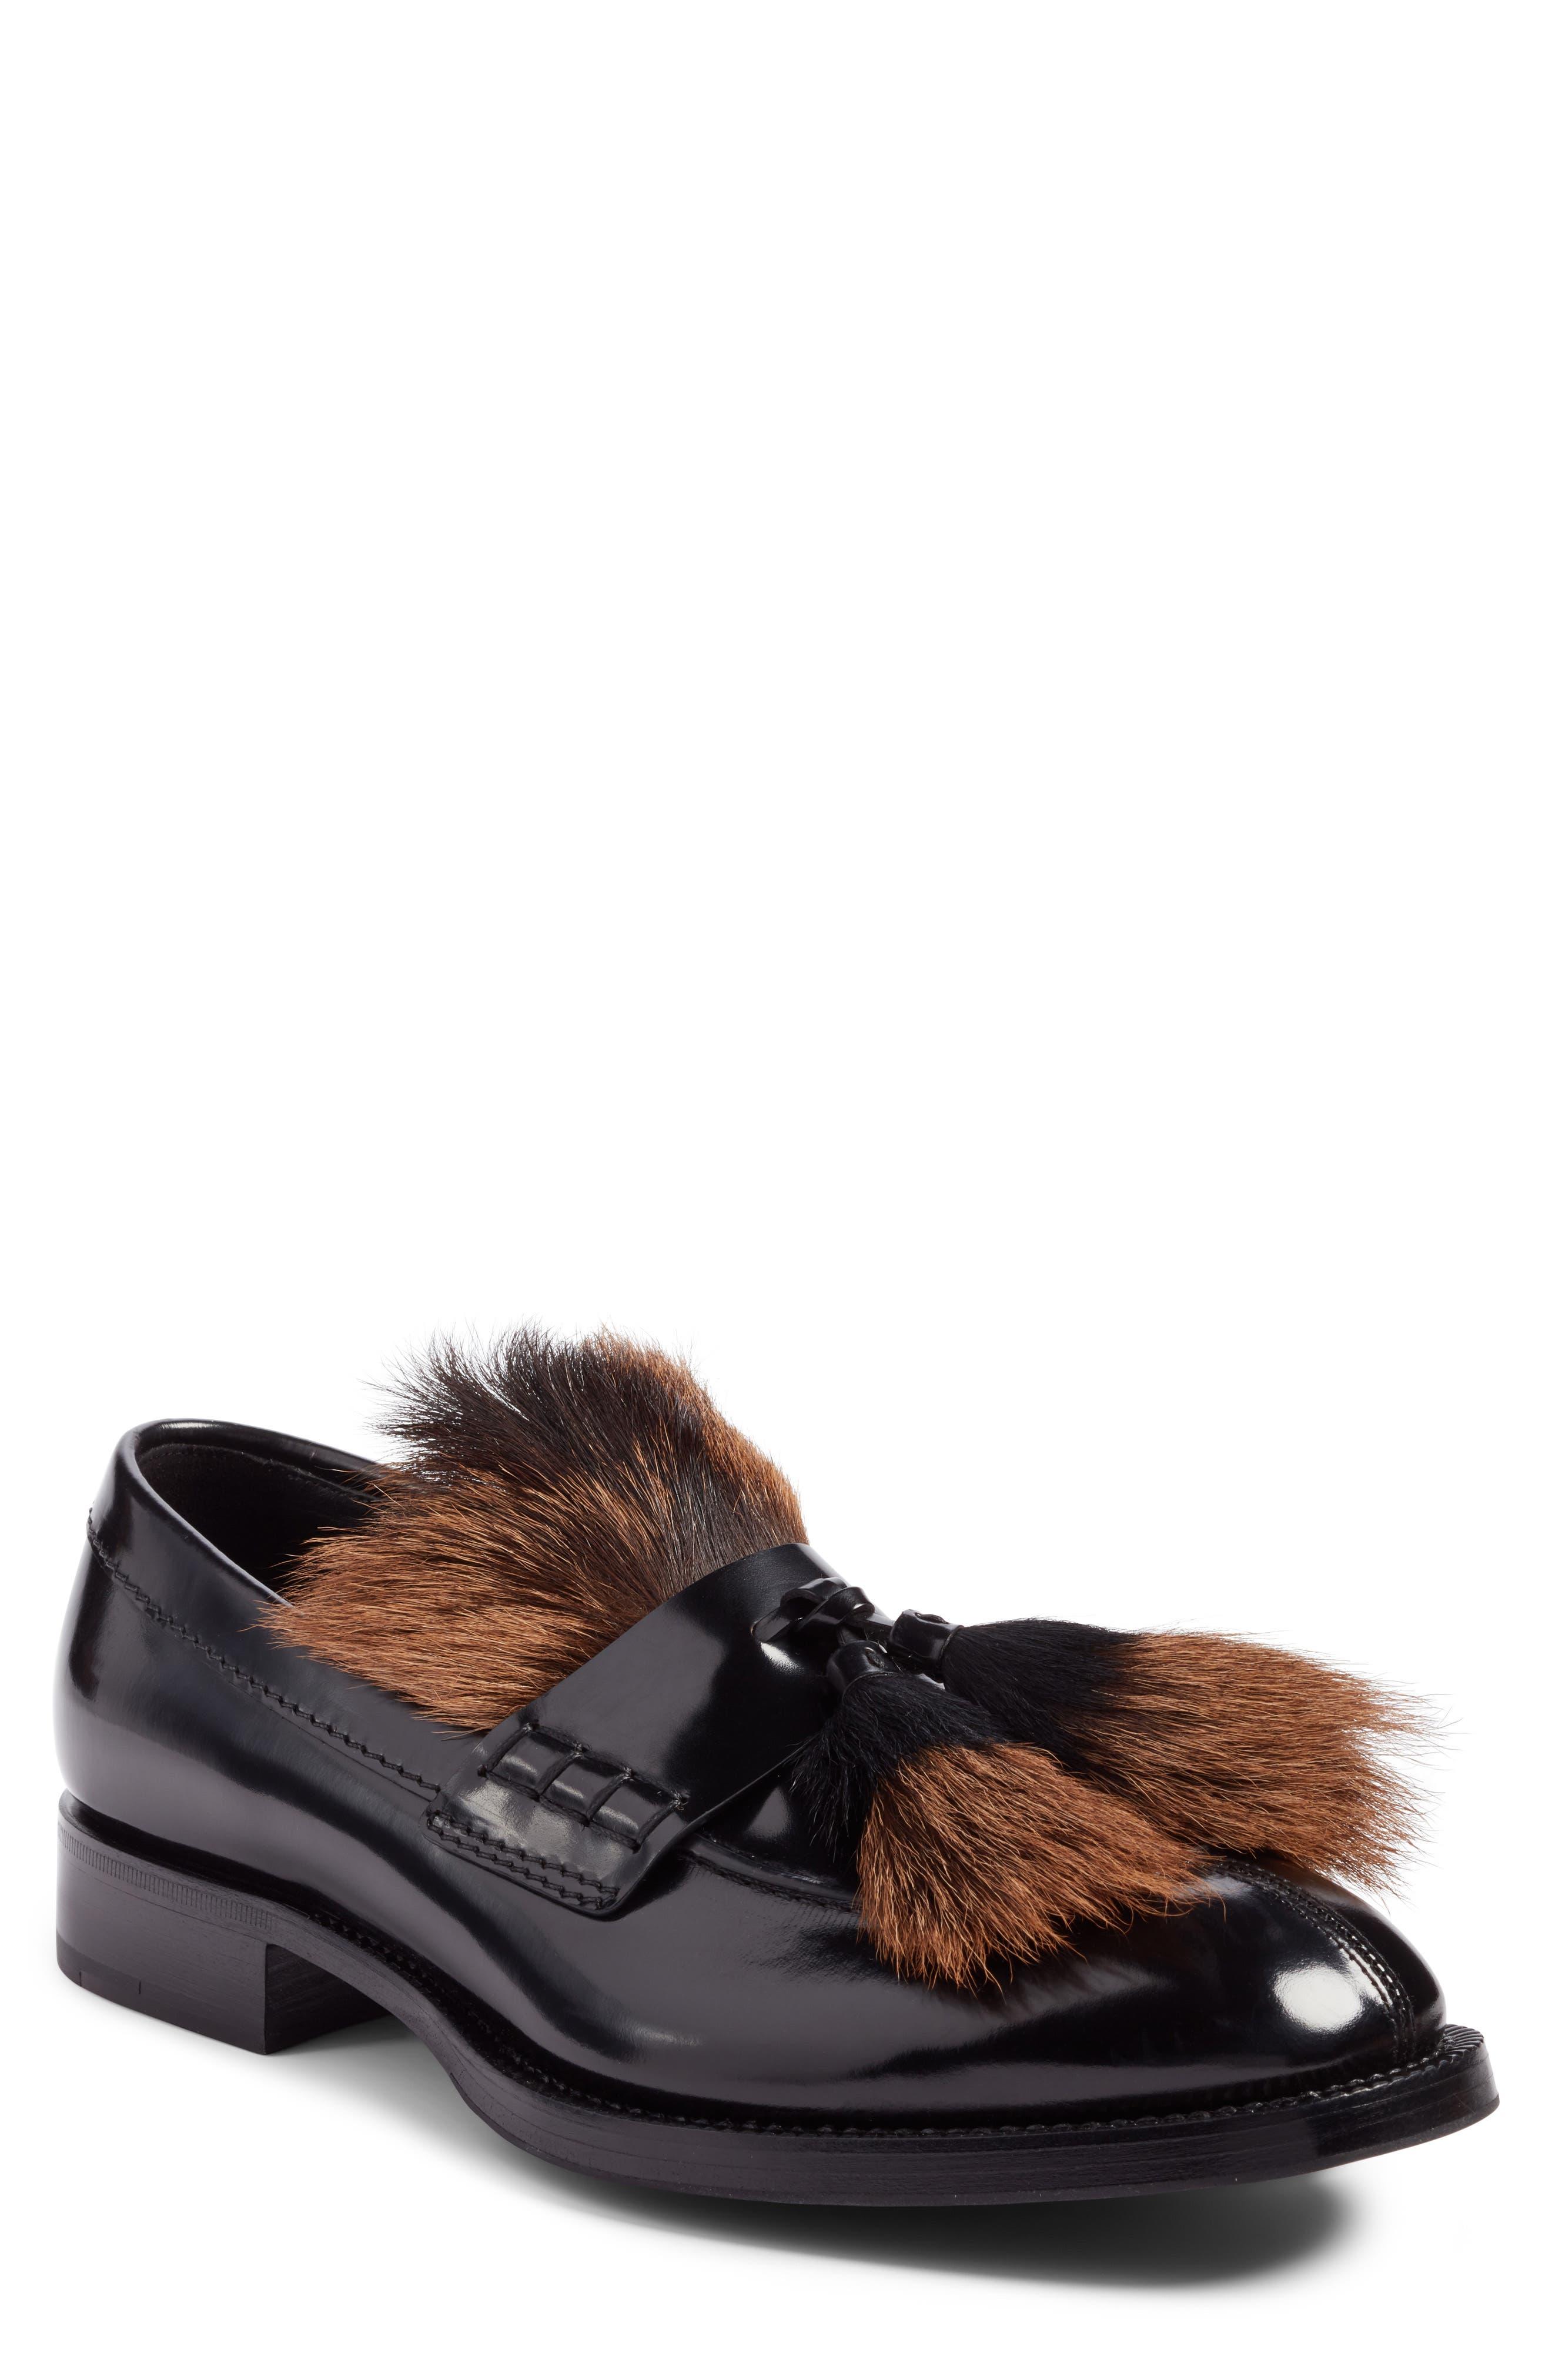 Main Image - Prada Tassel Loafer with Genuine Goat Hair Trim (Men)